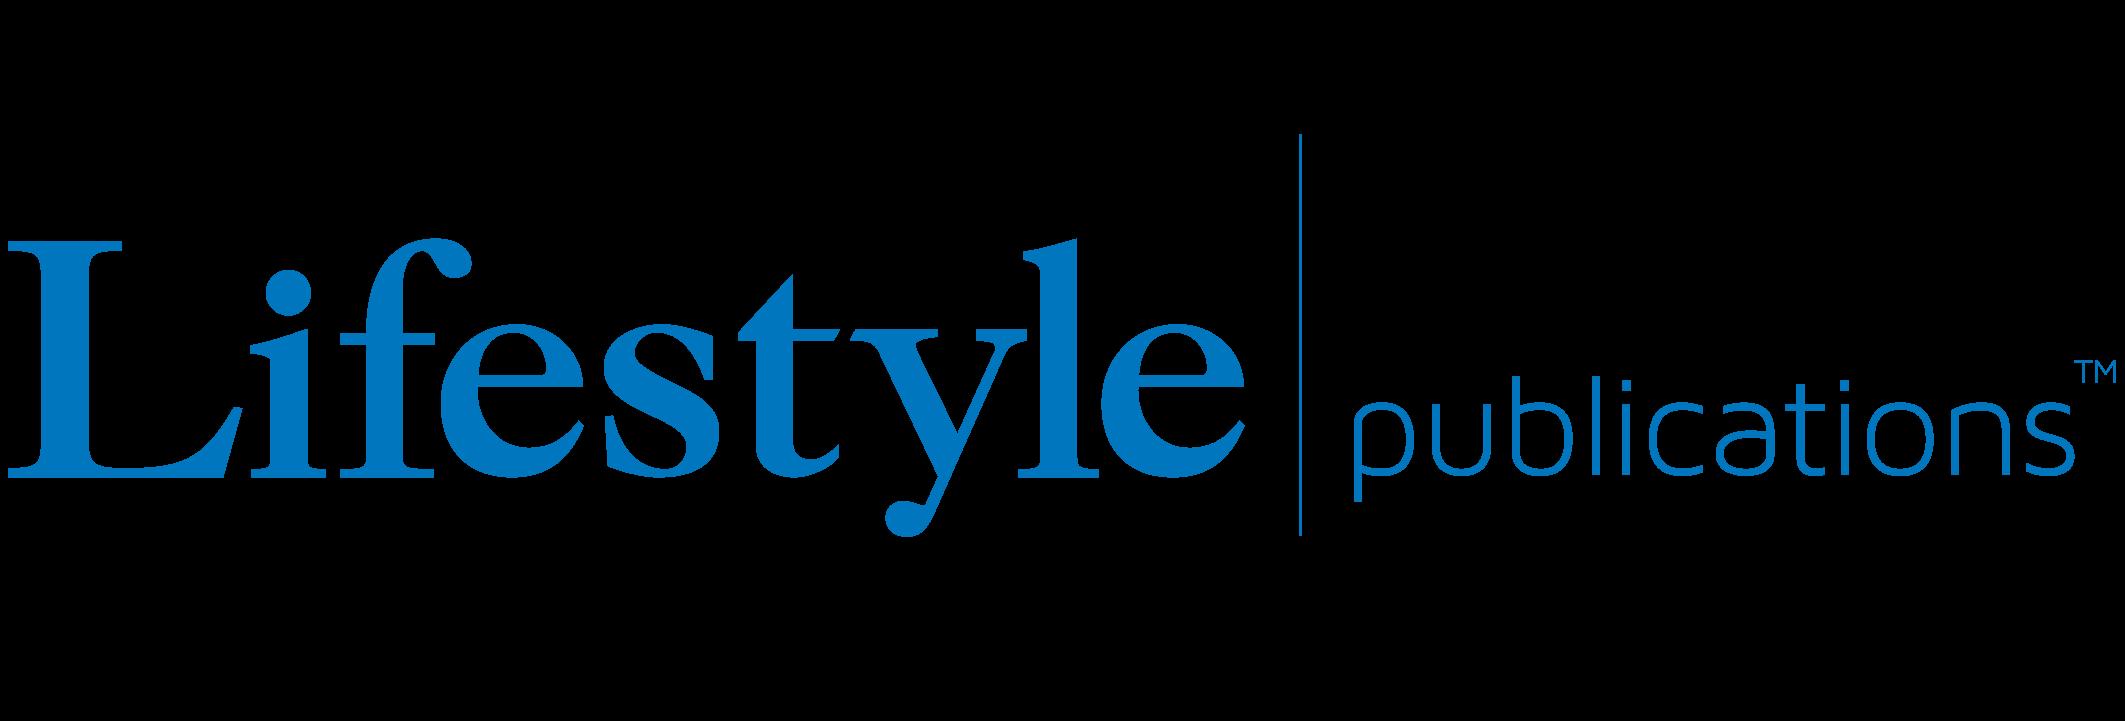 LifestylePublicationsBlue